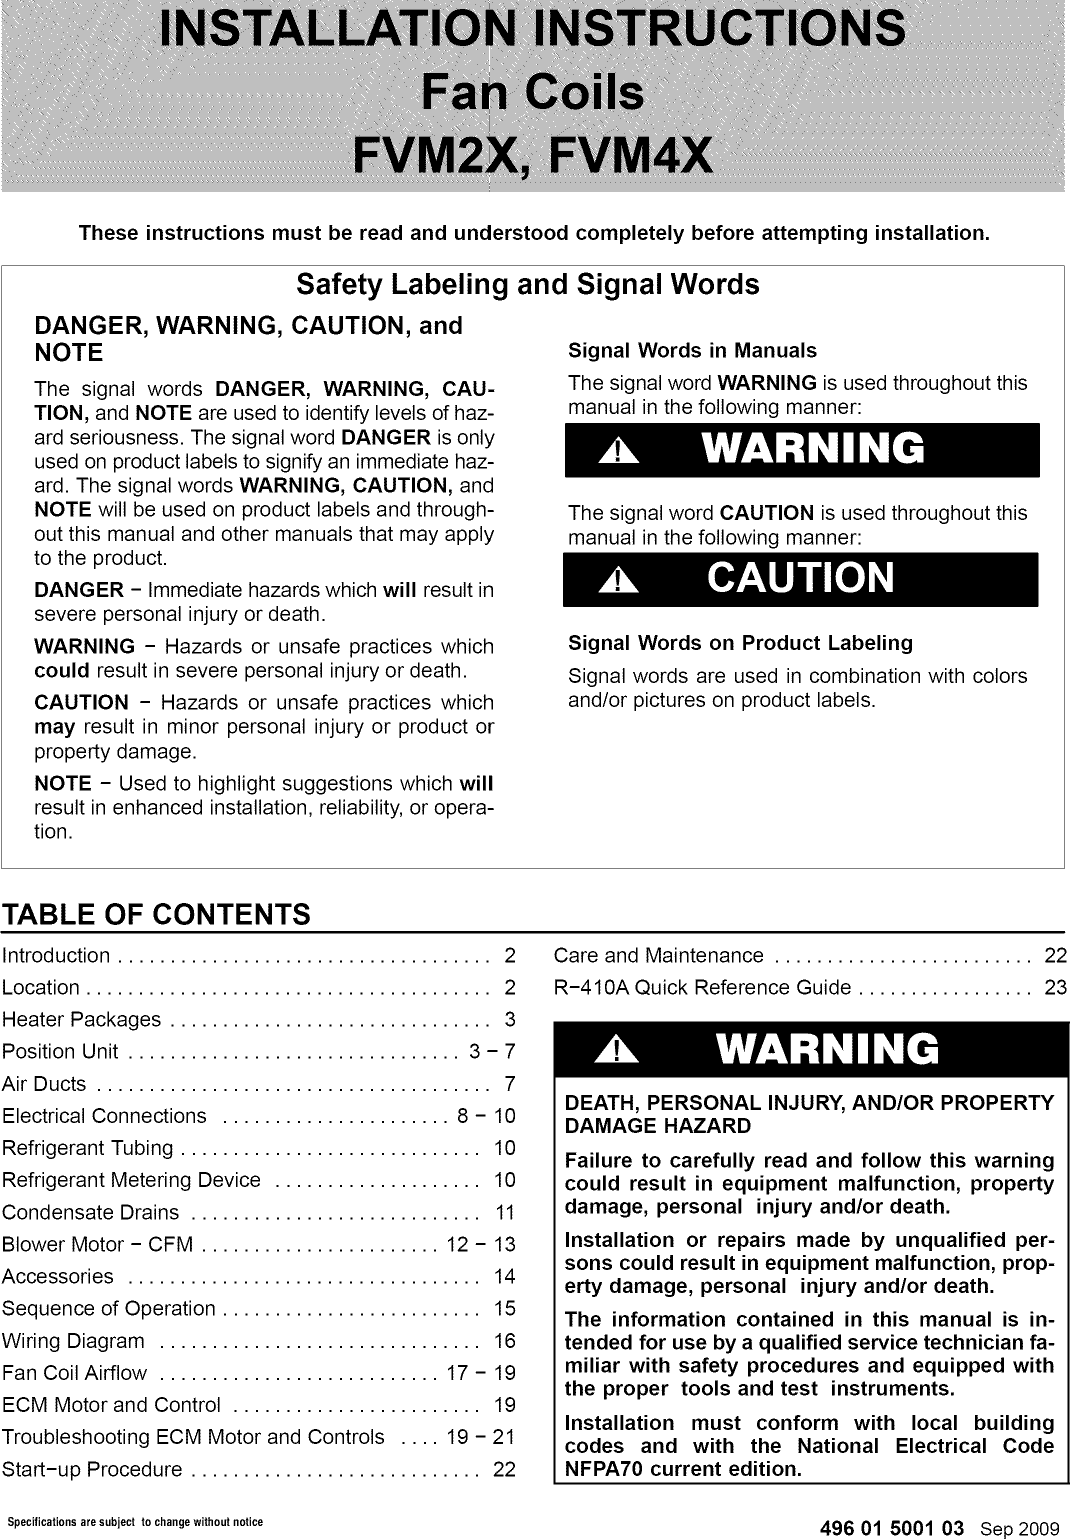 Icp Fvm2x2400a User Manual Fan Coil Manuals And Guides 1209404l Ecm Wiring Diagram